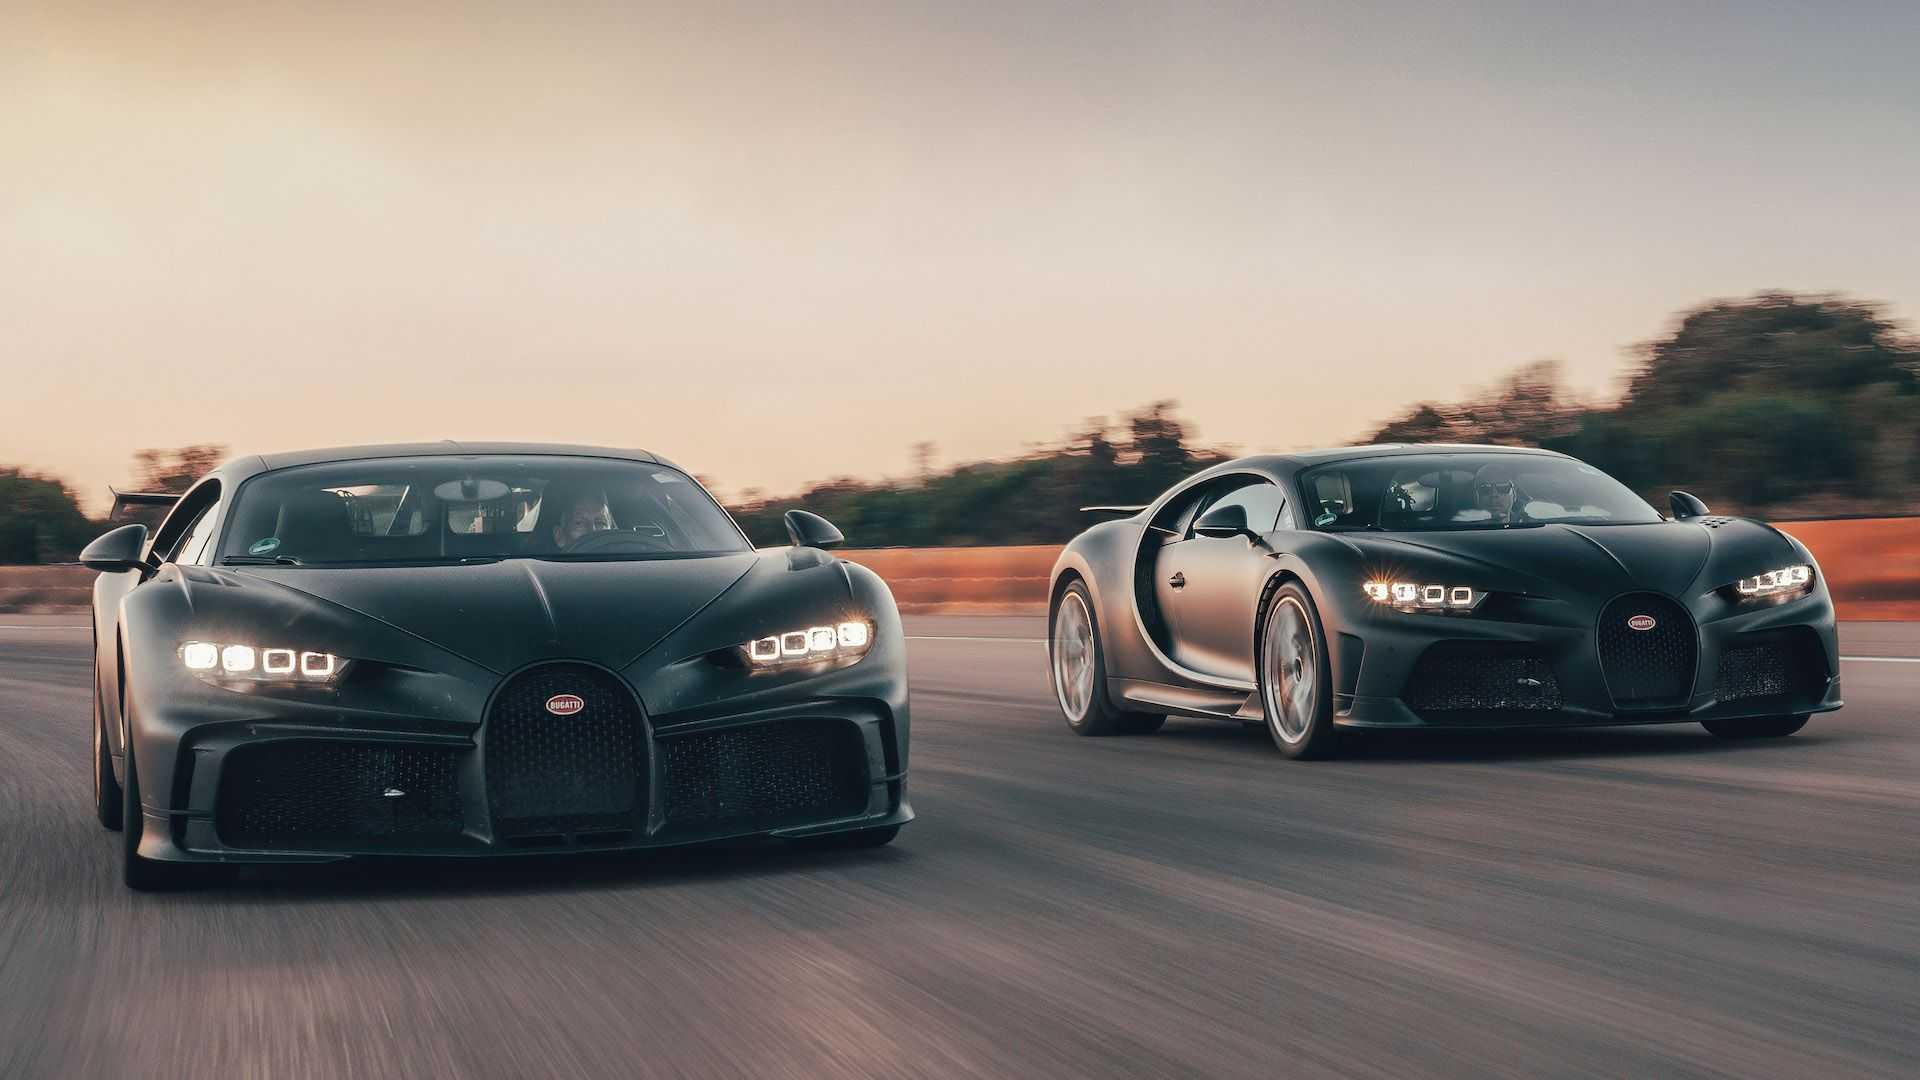 Bugatti Chiron Super Sport 300+ And Pur Sport Take On Nardo Together